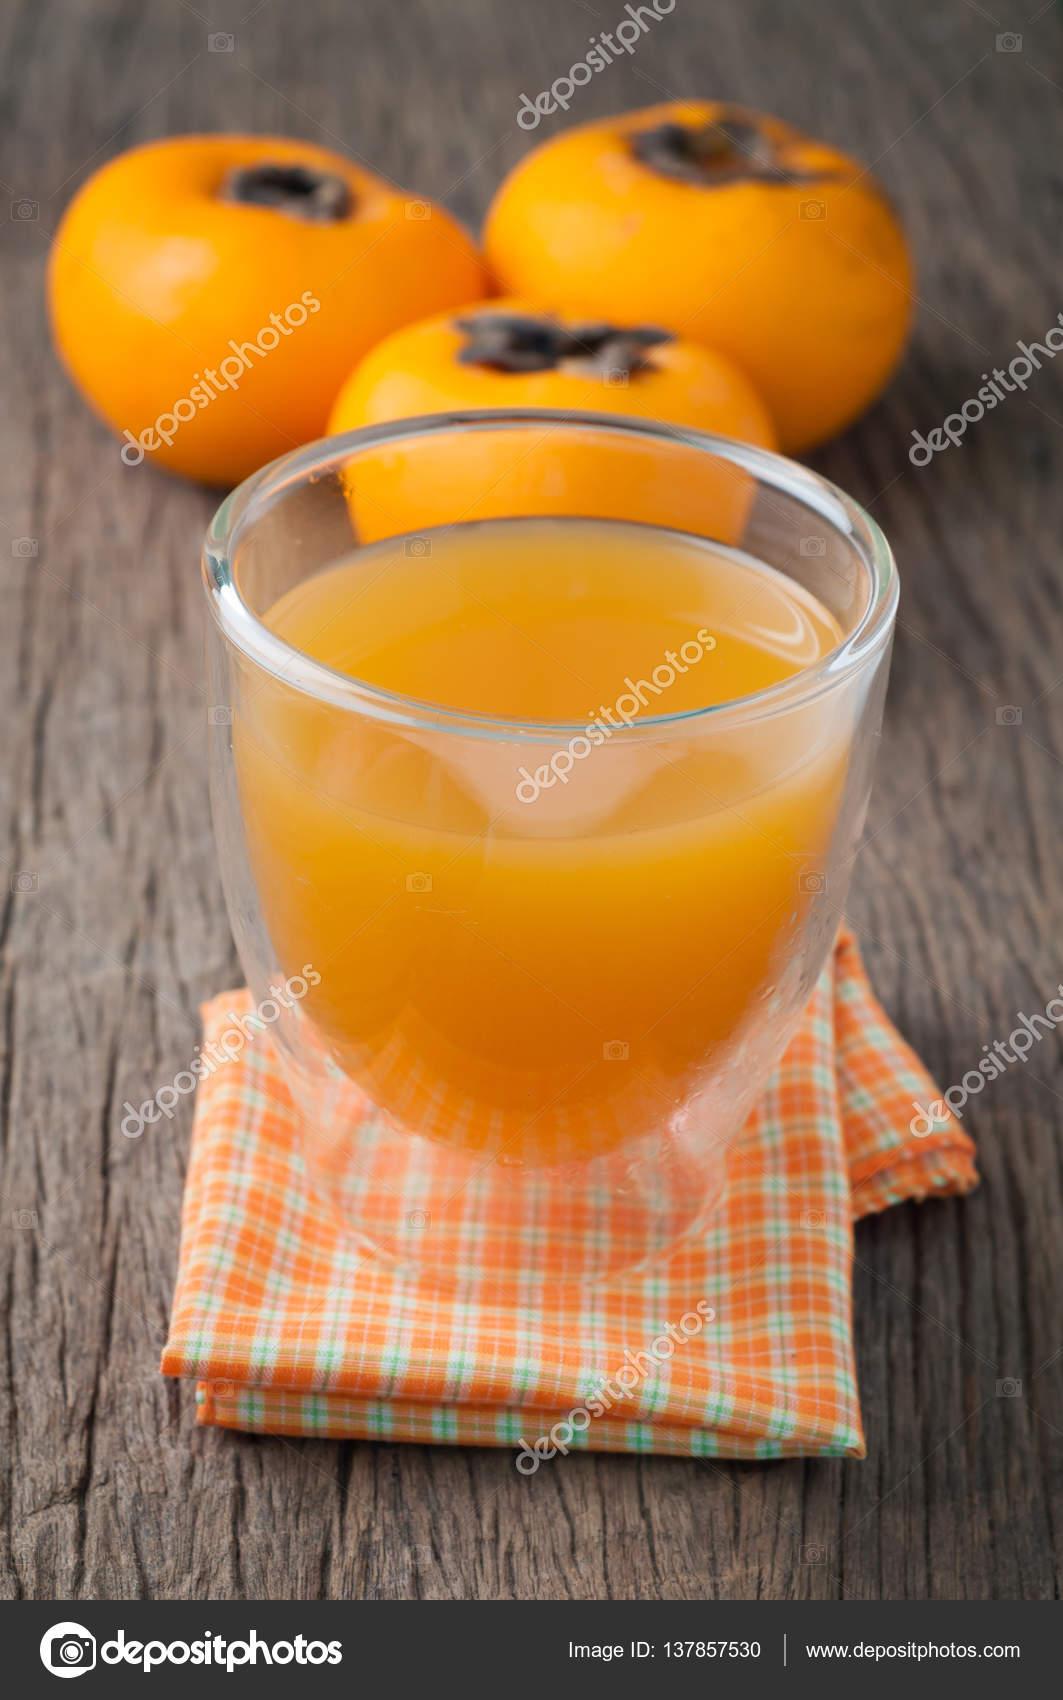 glass top kitchen table windsor chairs 与橙色柿汁 健康的估计 玻璃餐桌 图库照片 c awaygy 137857530 厨房的桌子与玻璃的桔子柿子汁 健康饮食和节食食品 卫生保健 图像焦点顶视图的概念 照片作者awaygy